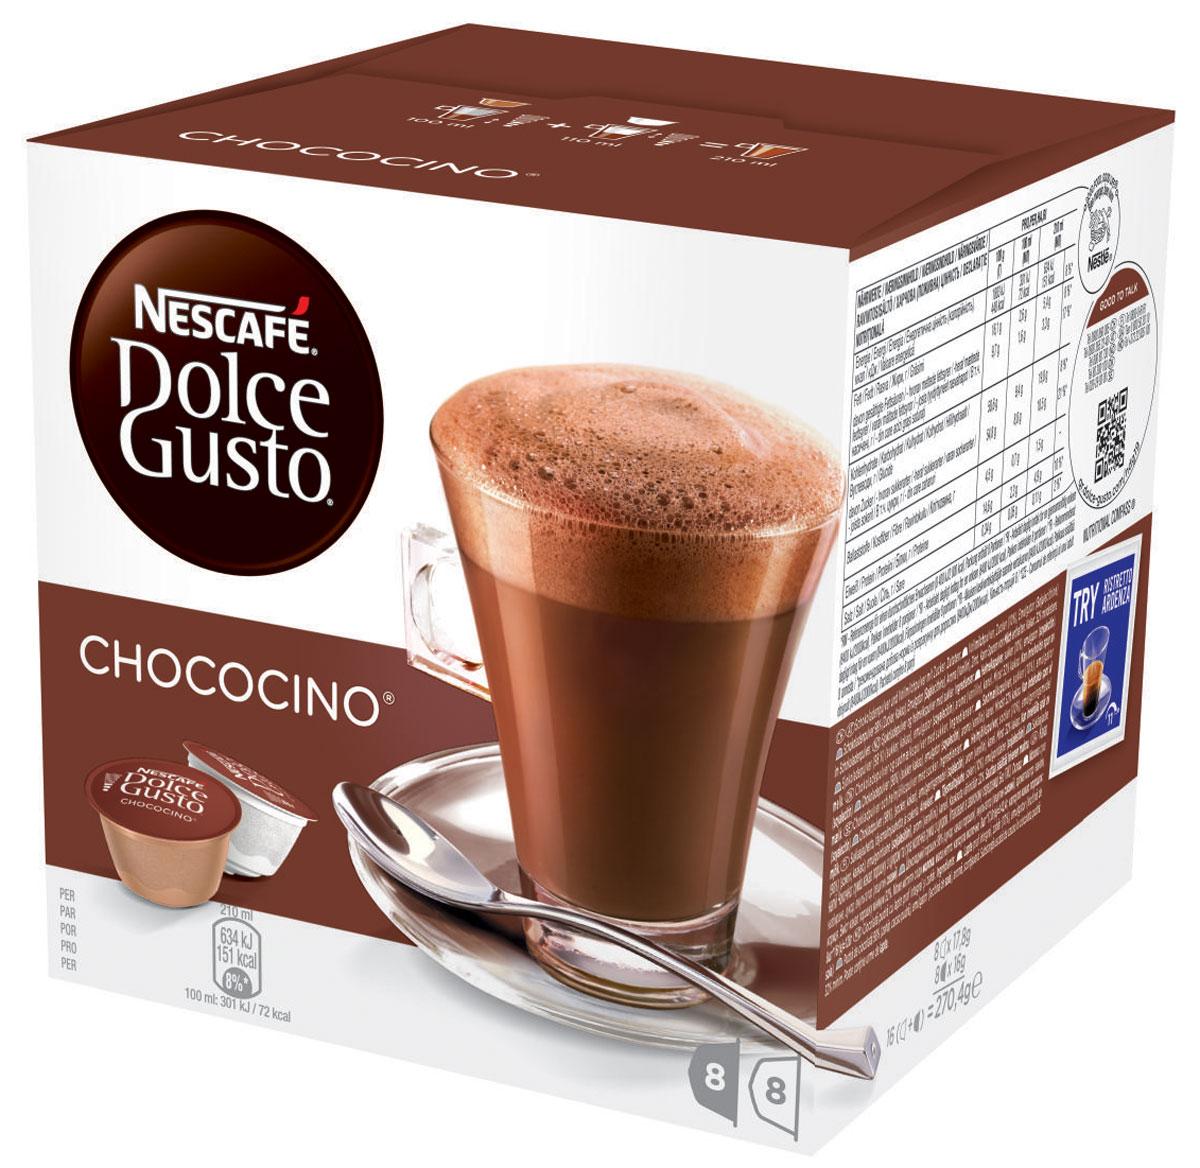 Nescafe Dolce Gusto Chococino горячий шоколад в капсулах, 16 шт 5219918